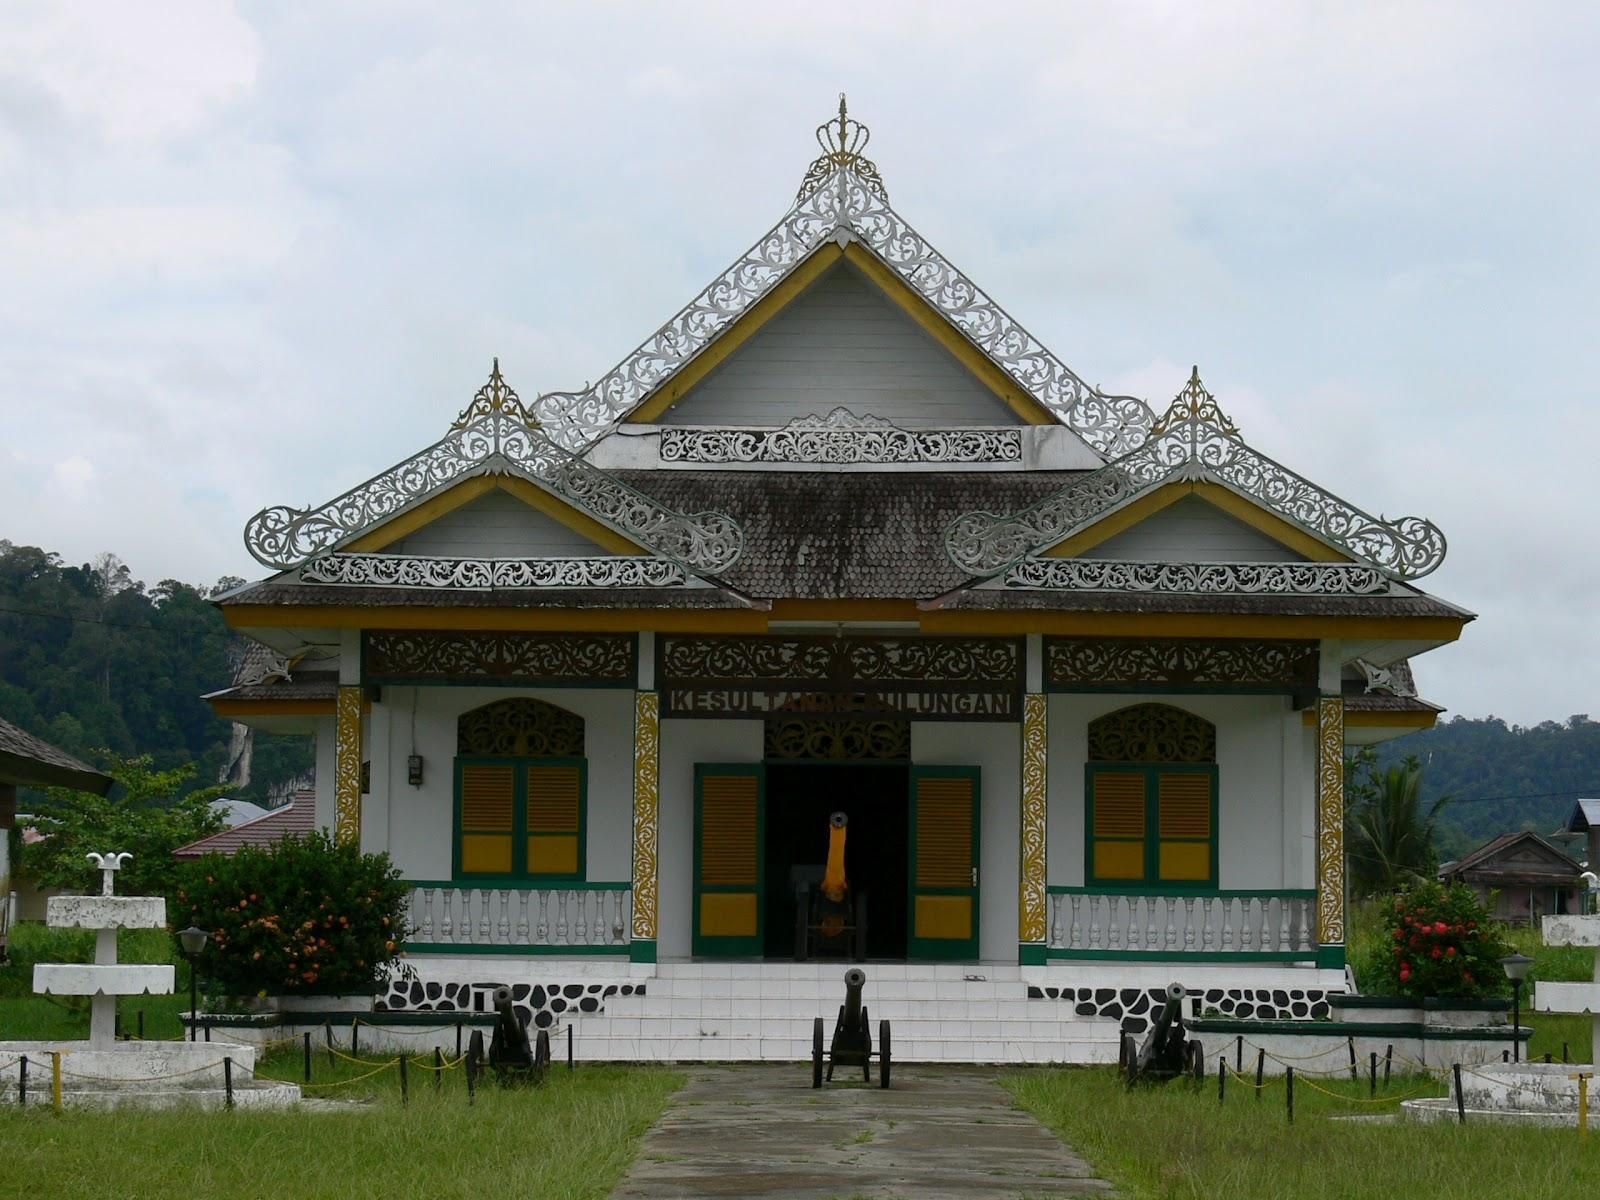 Sejarah Kesultanan Bulungan Kalimantan Utara Istana Olahraga Air Kab